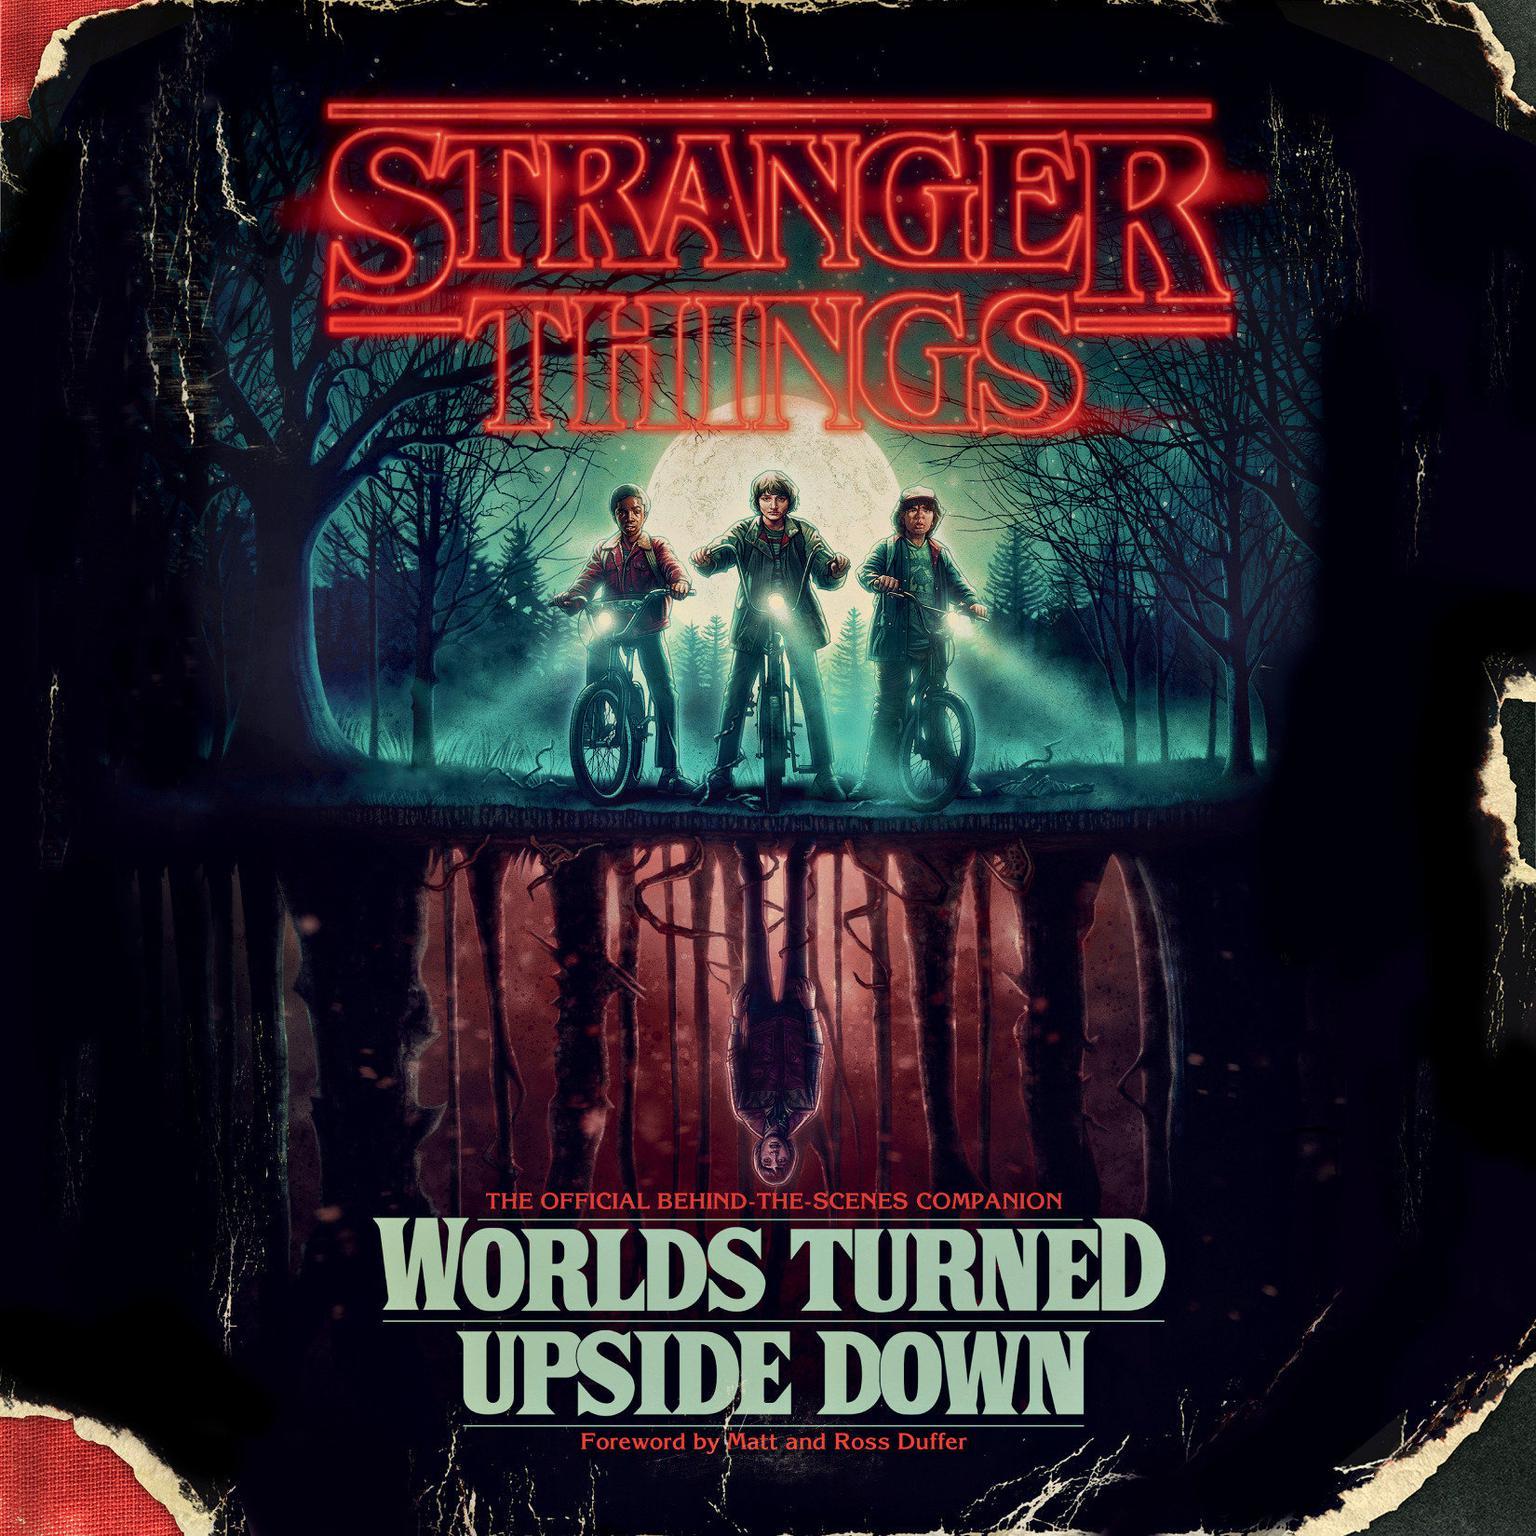 upside down full movie hd download